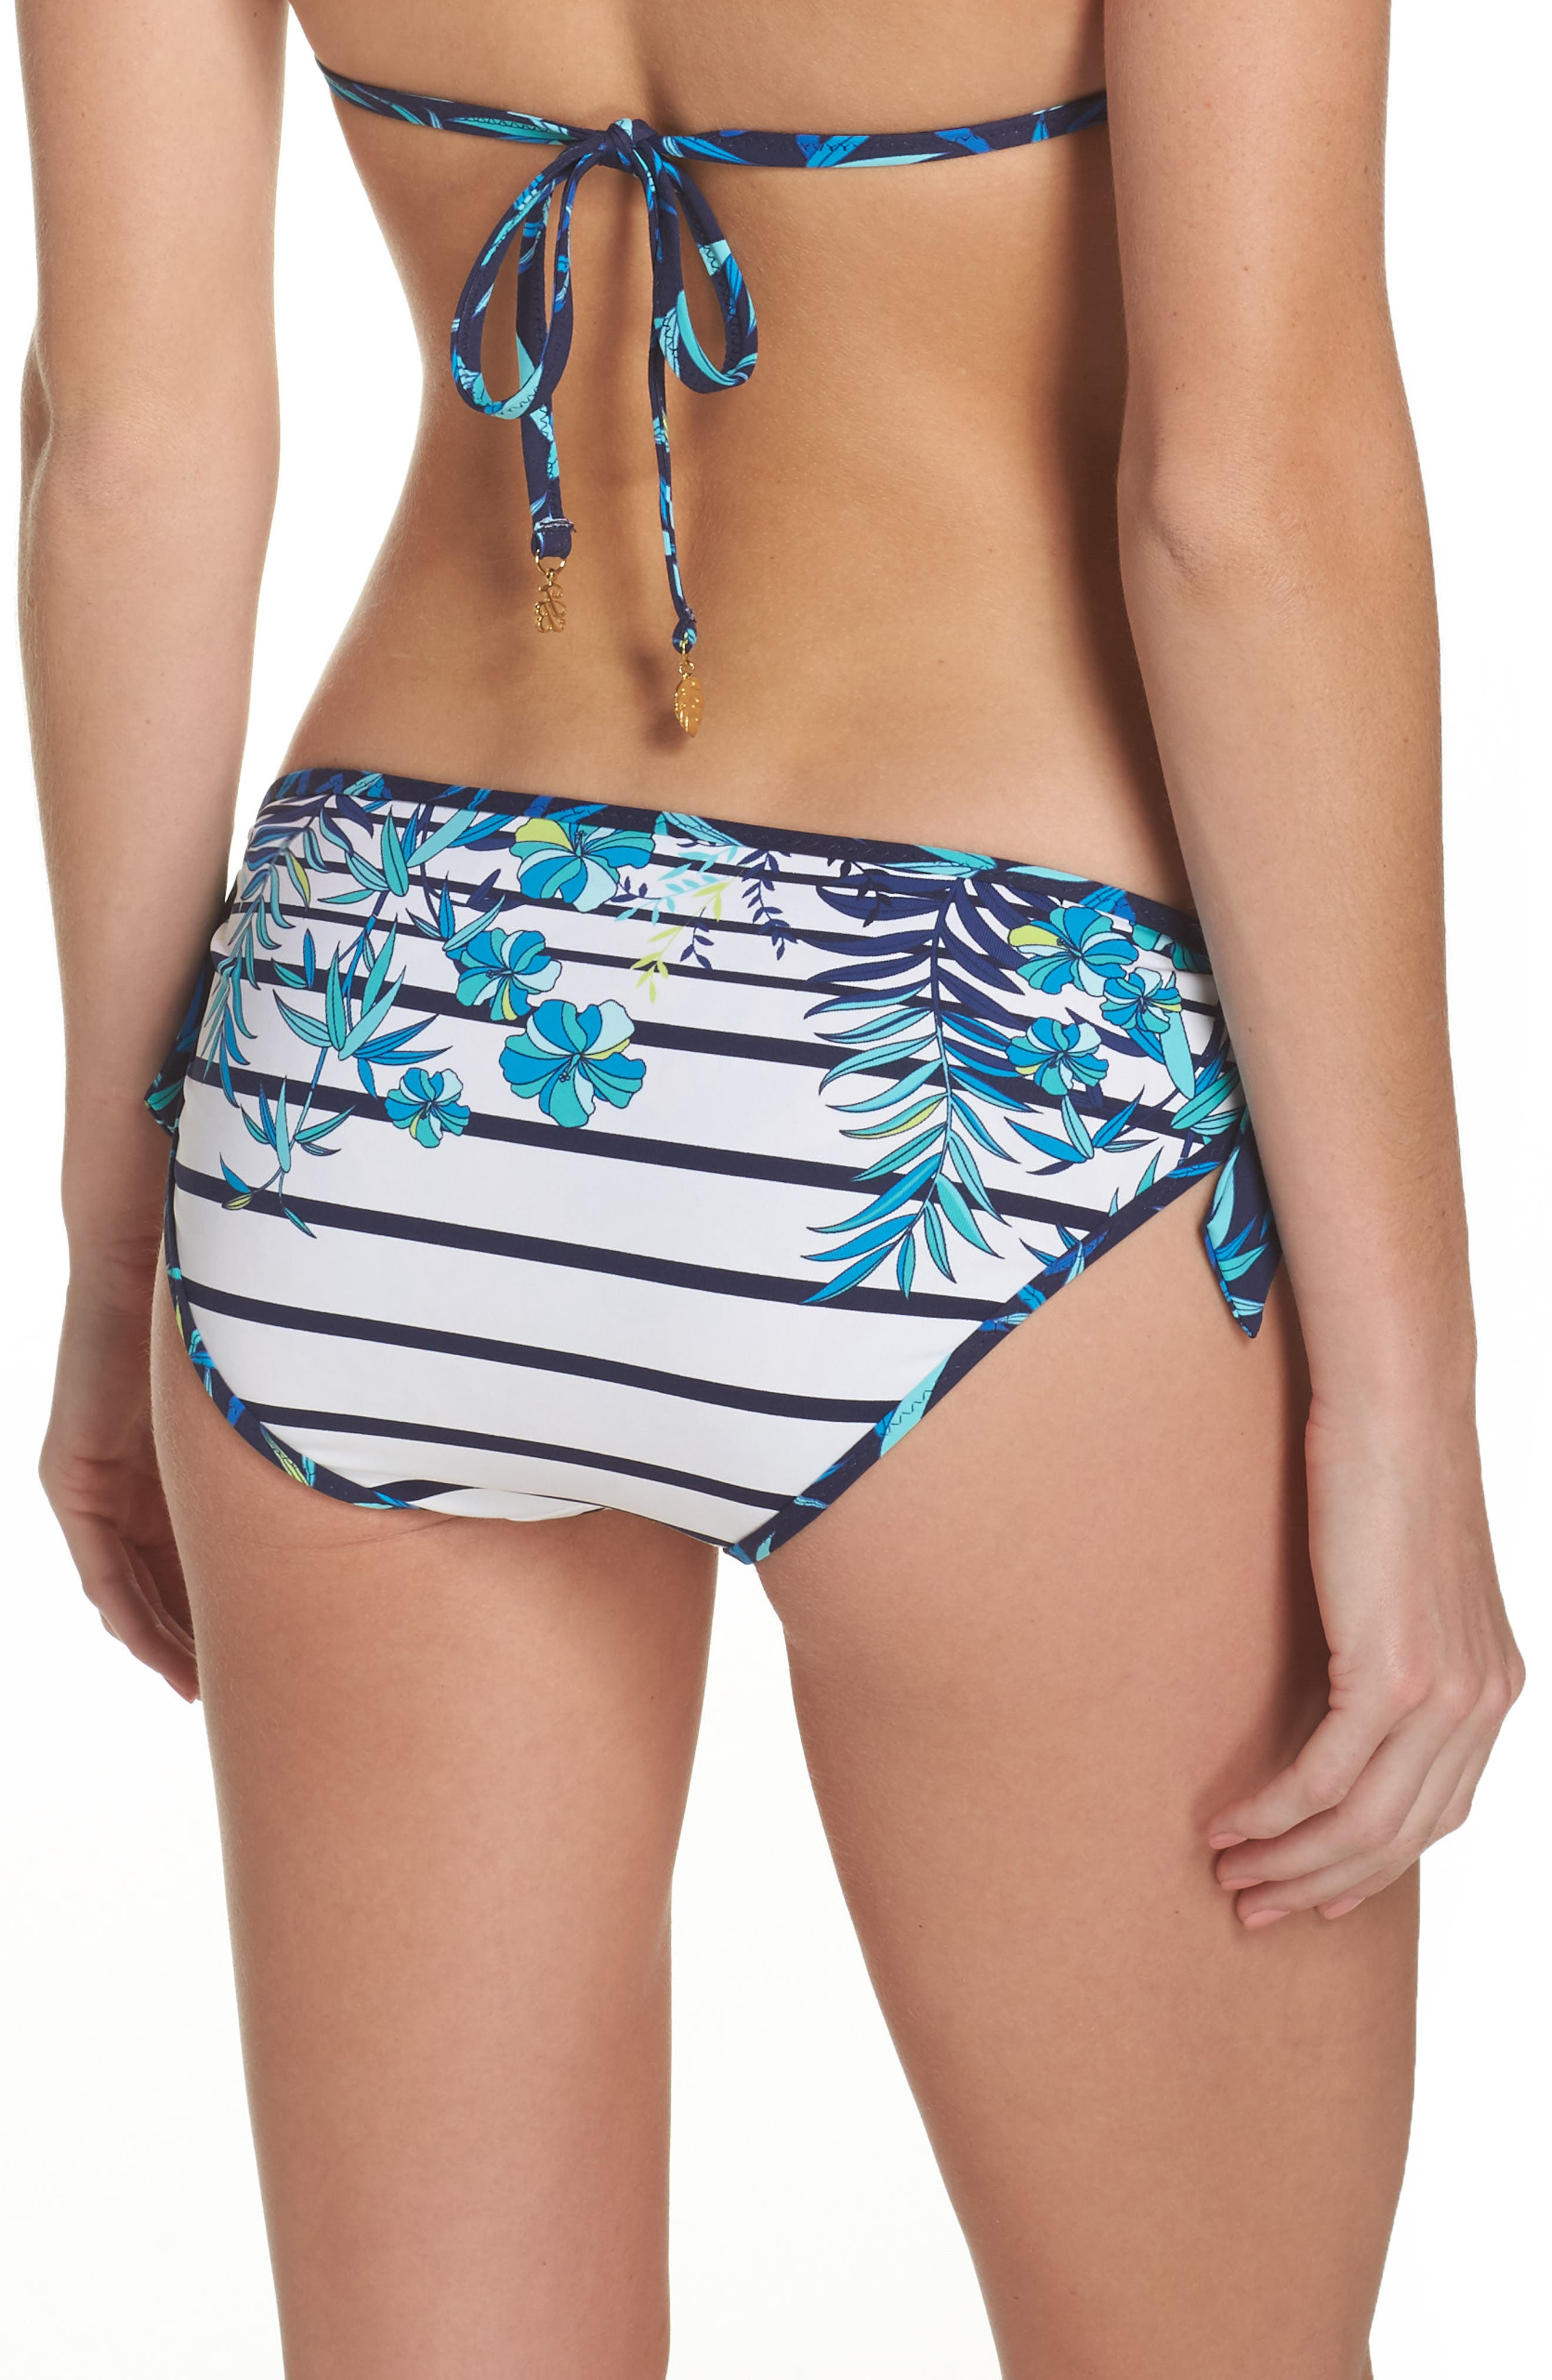 Tropical Swirl Reversible Bikini Bottoms,                             Alternate thumbnail 2, color,                             Blue/ White